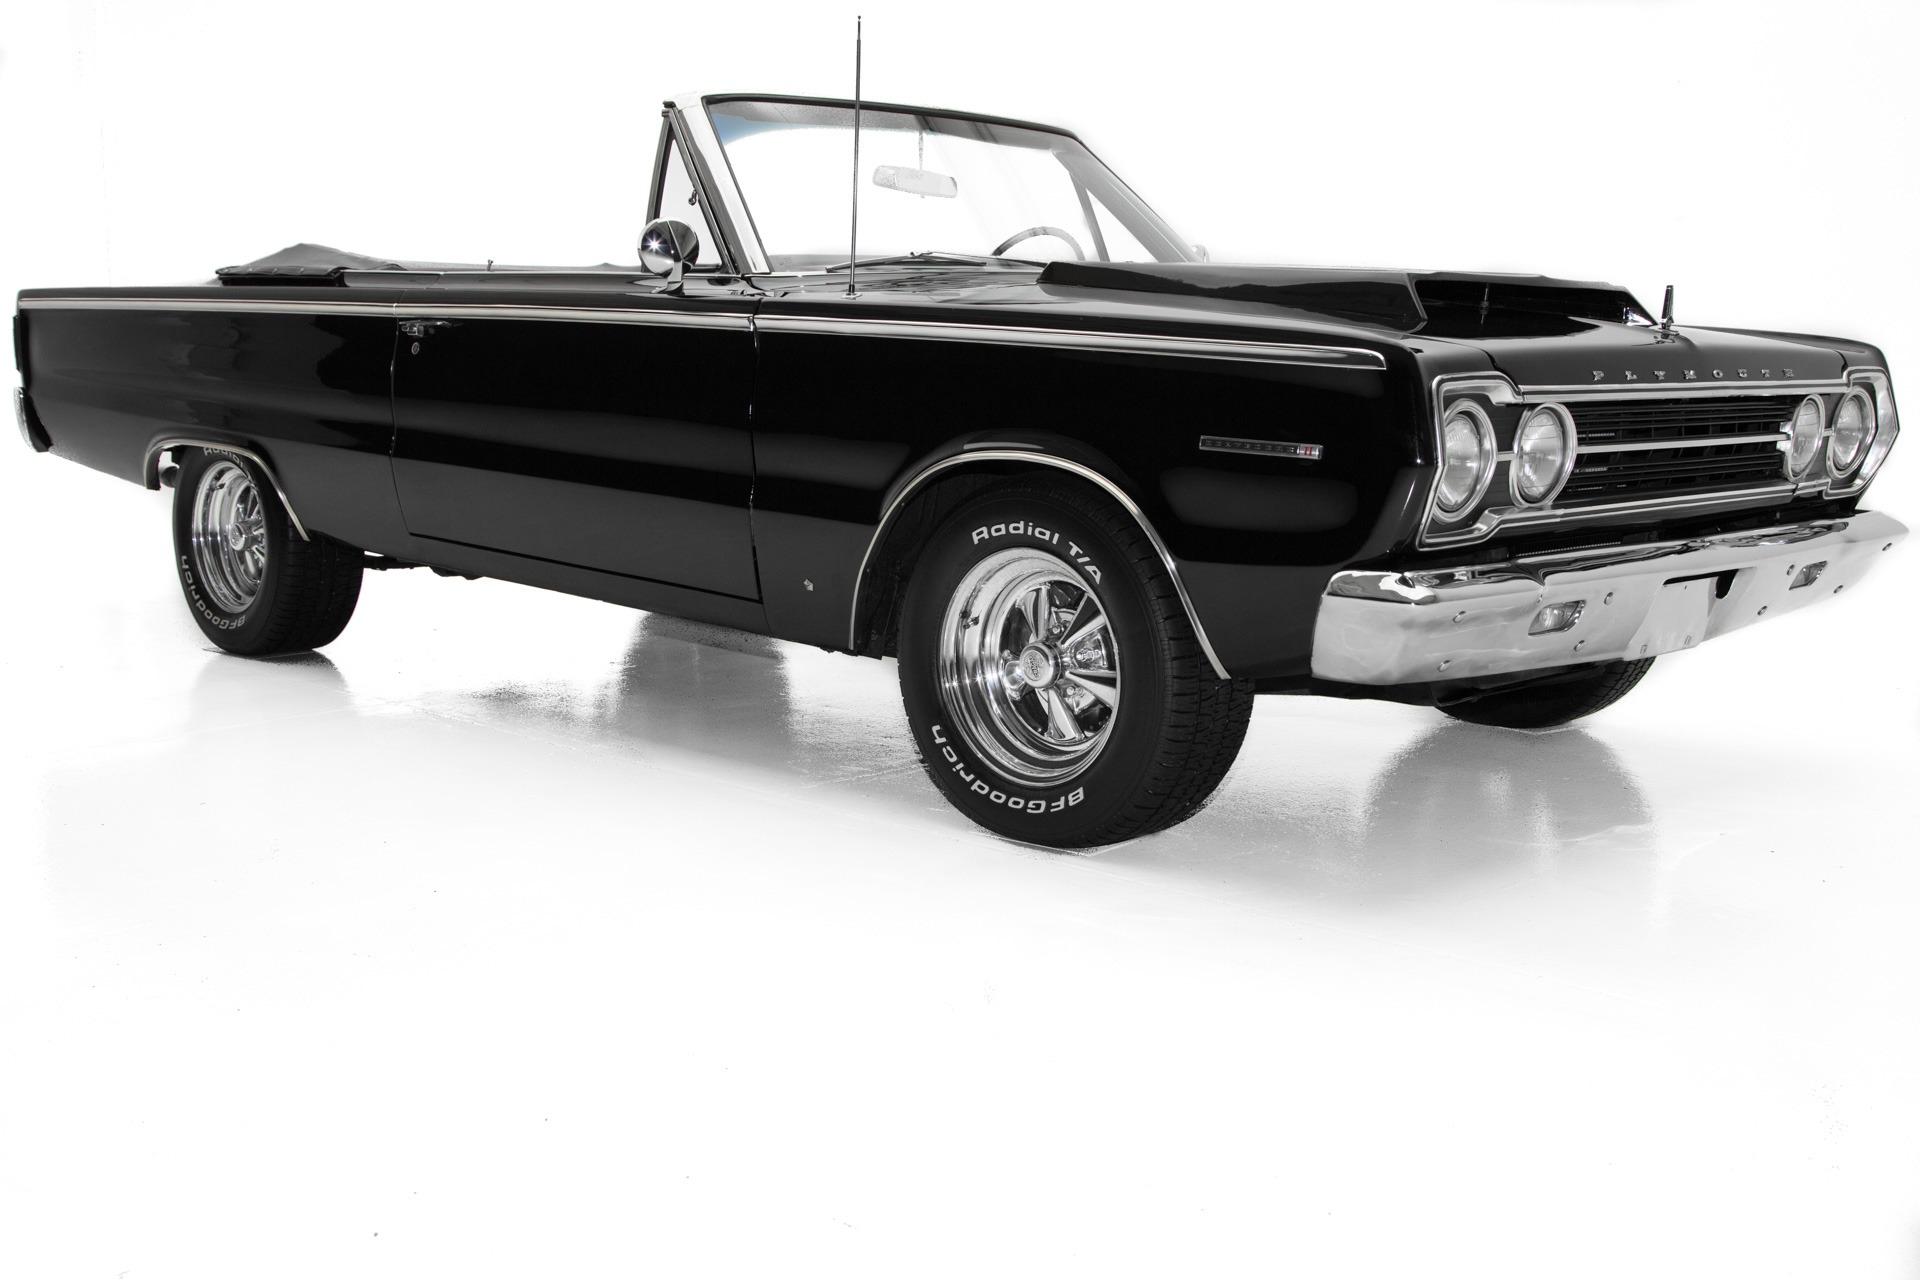 Photo 1967 Plymouth Belvedere II Triple Black, New 360, 727